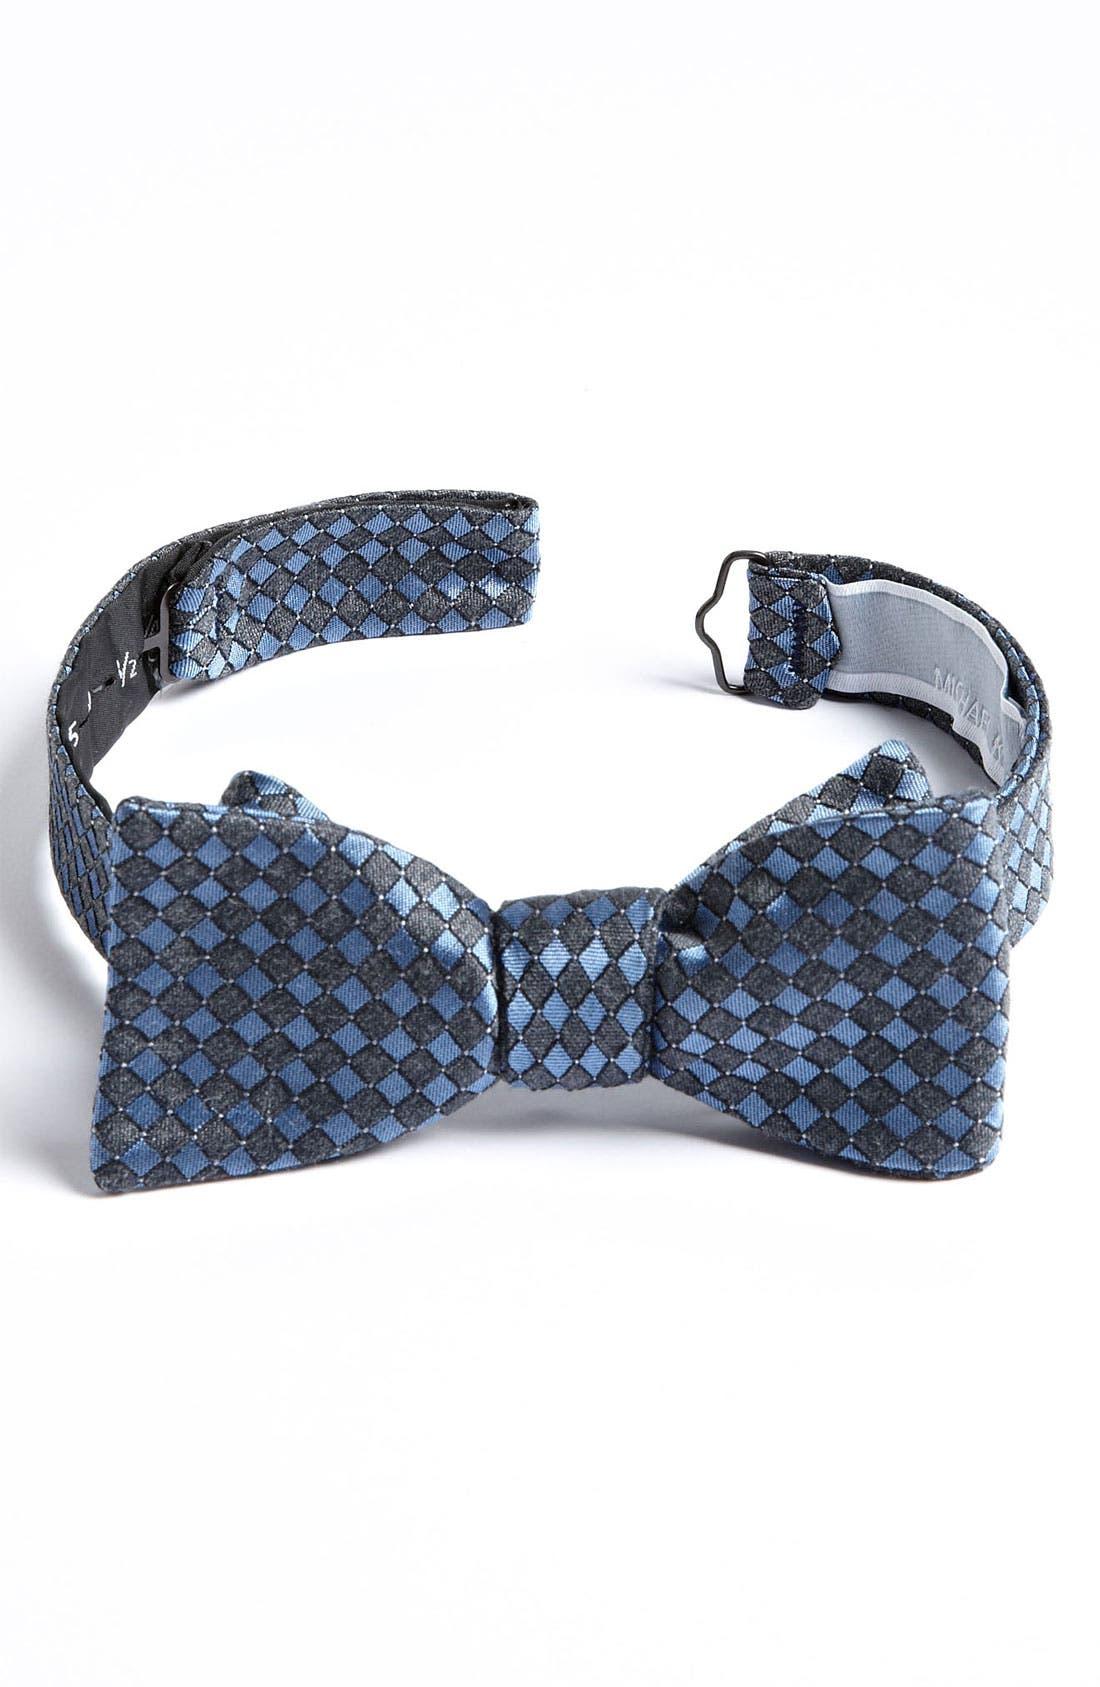 Alternate Image 1 Selected - Michael Kors Silk Blend Bow Tie